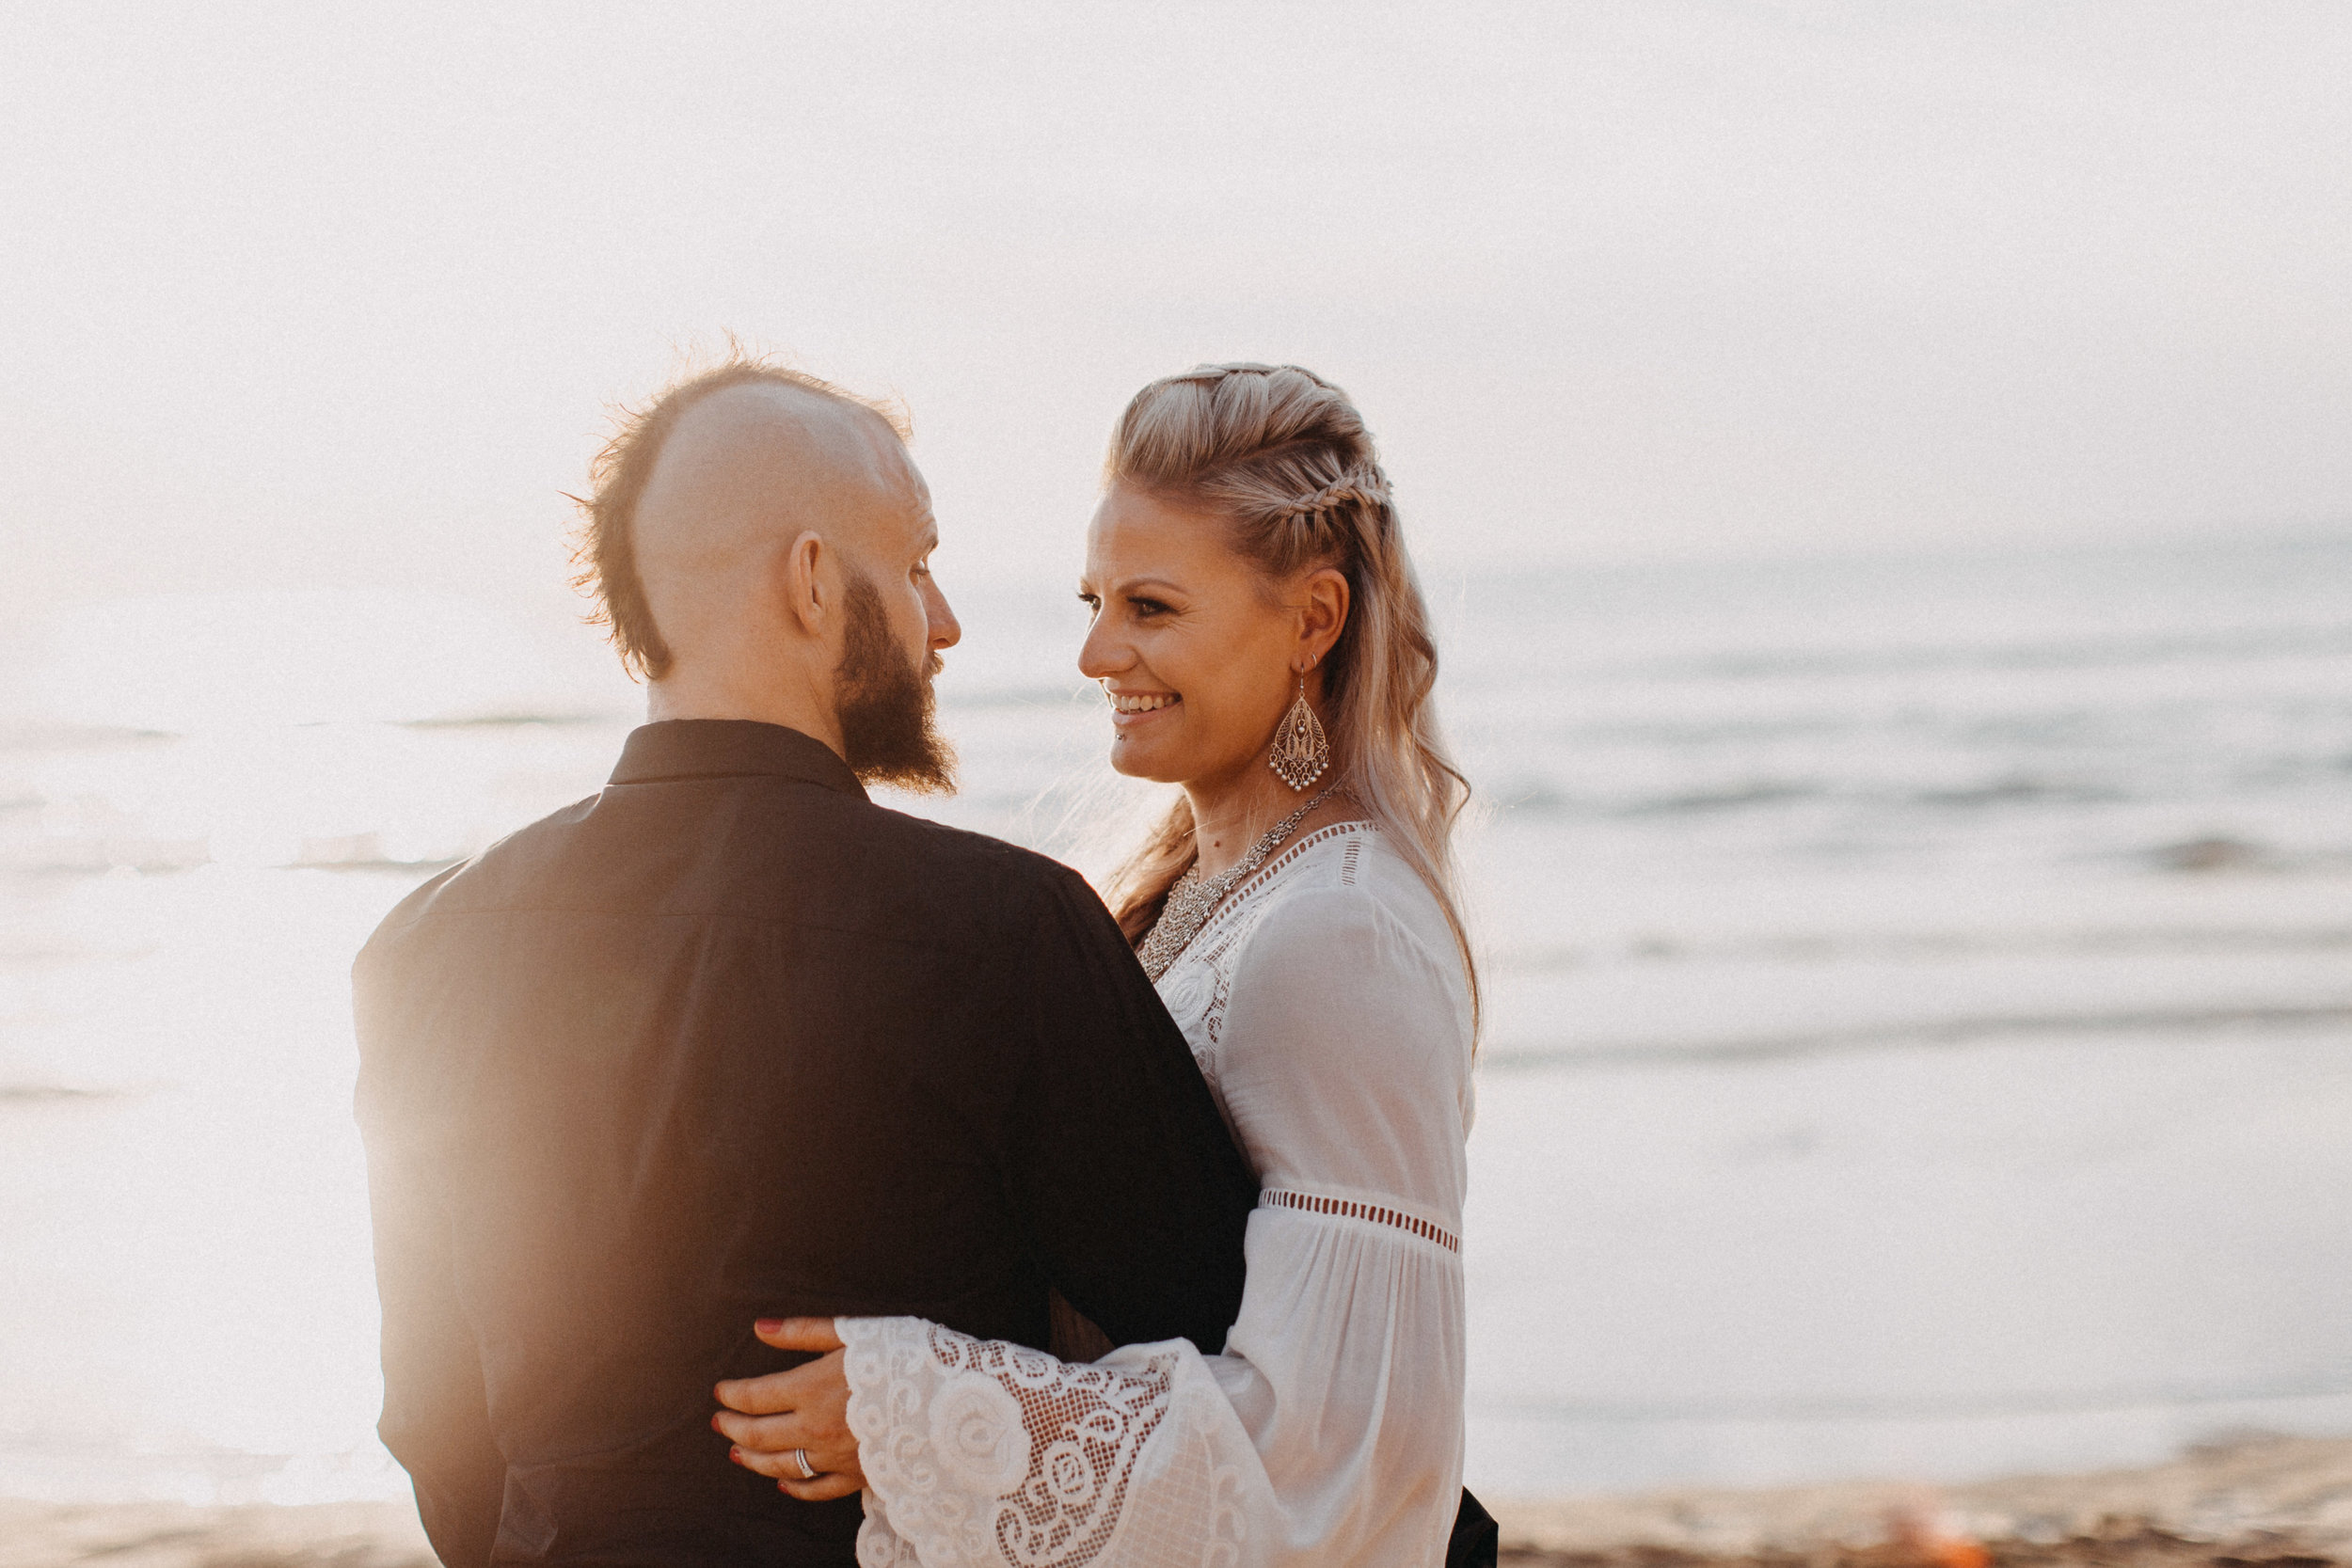 darwin-elopement-wedding-beach-camden-photography-www.emilyobrienphotography.net-61.jpg